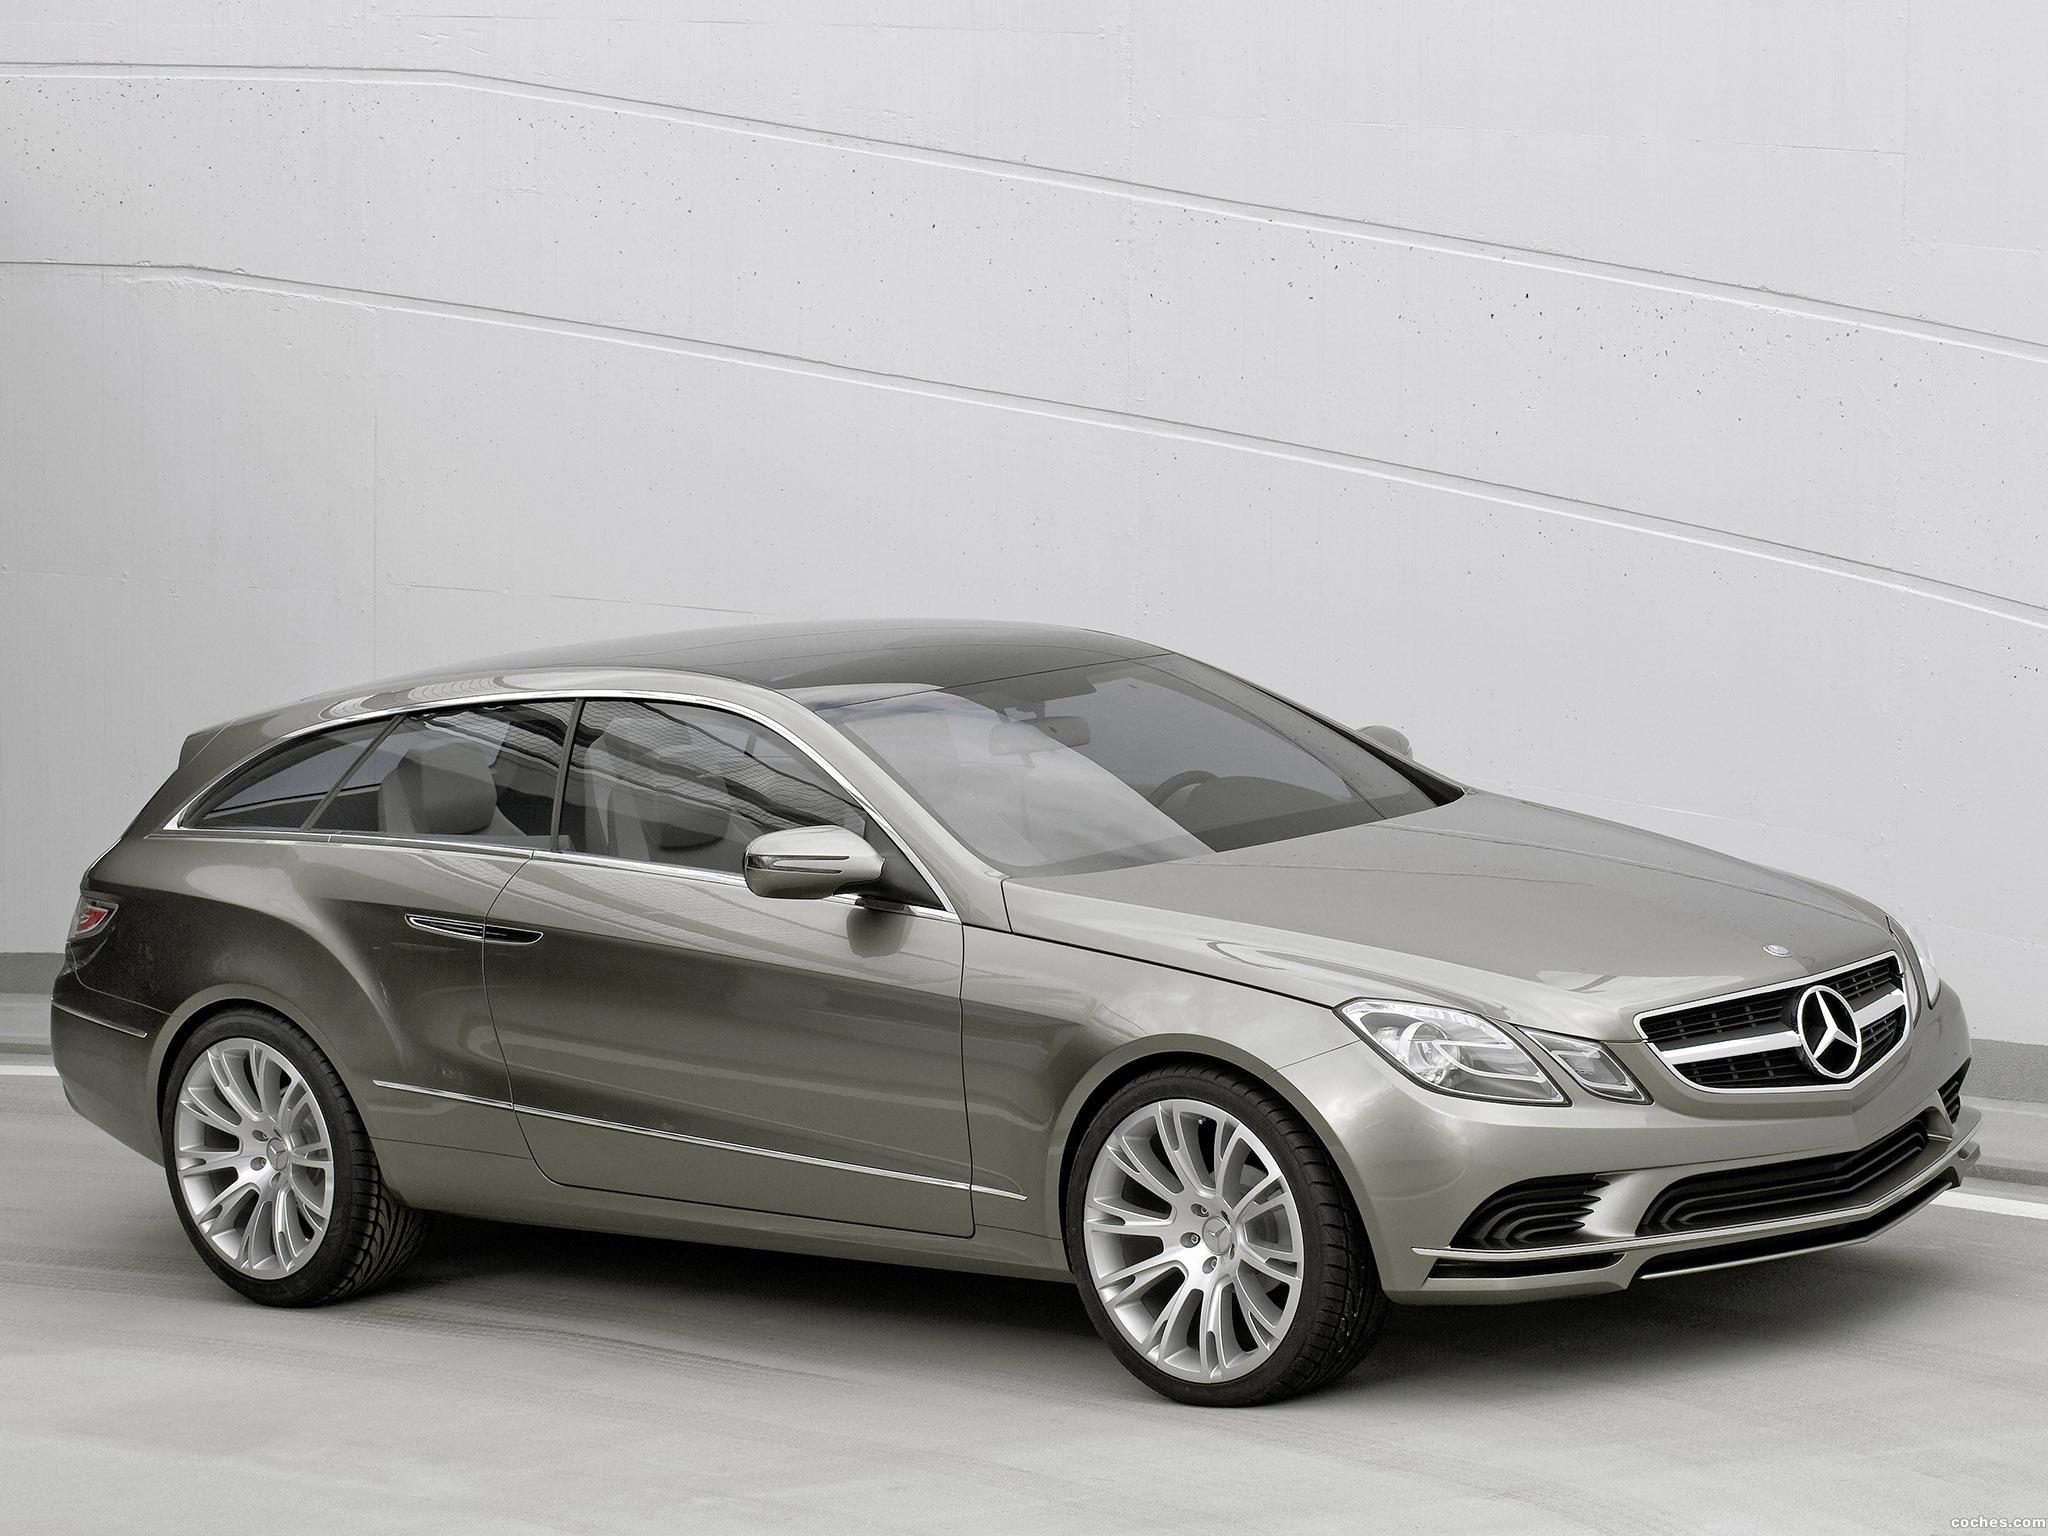 Foto 0 de Mercedes Fascination Concept 2008